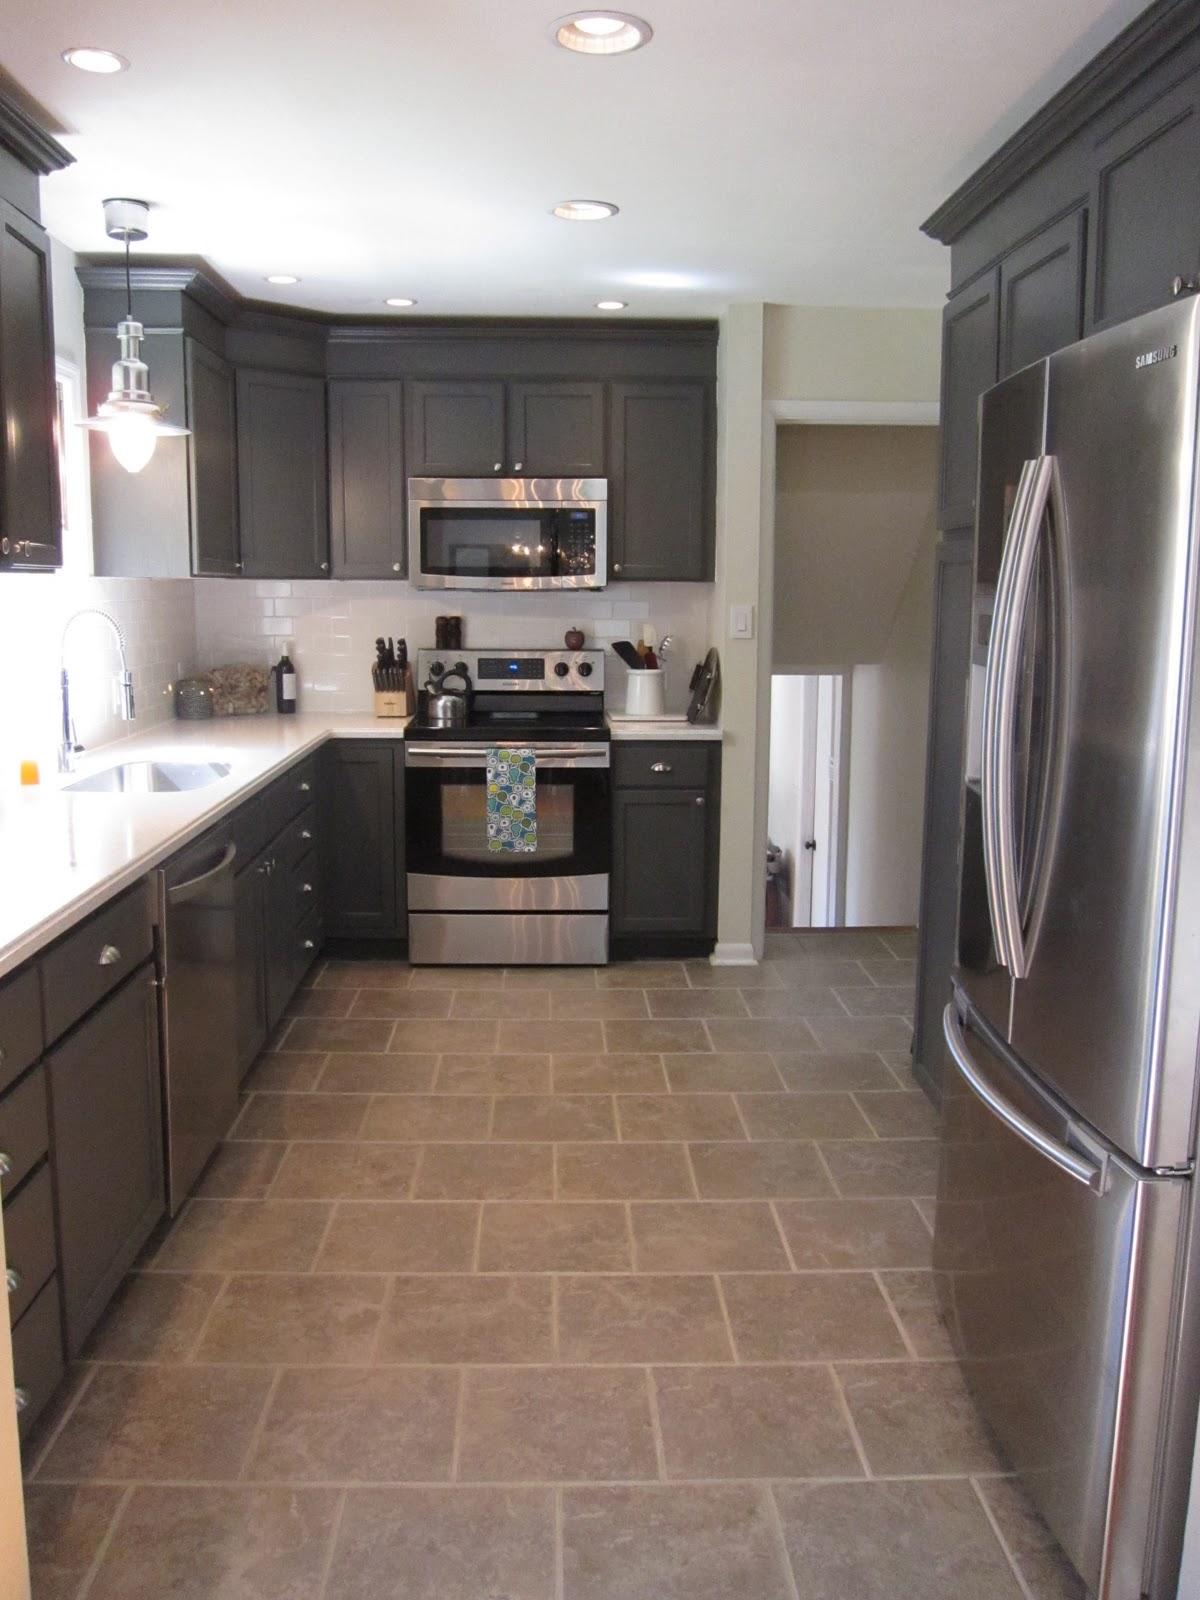 Remodelaholic Gray And White Kitchen Makeover With Hexagon Tile Backsplash